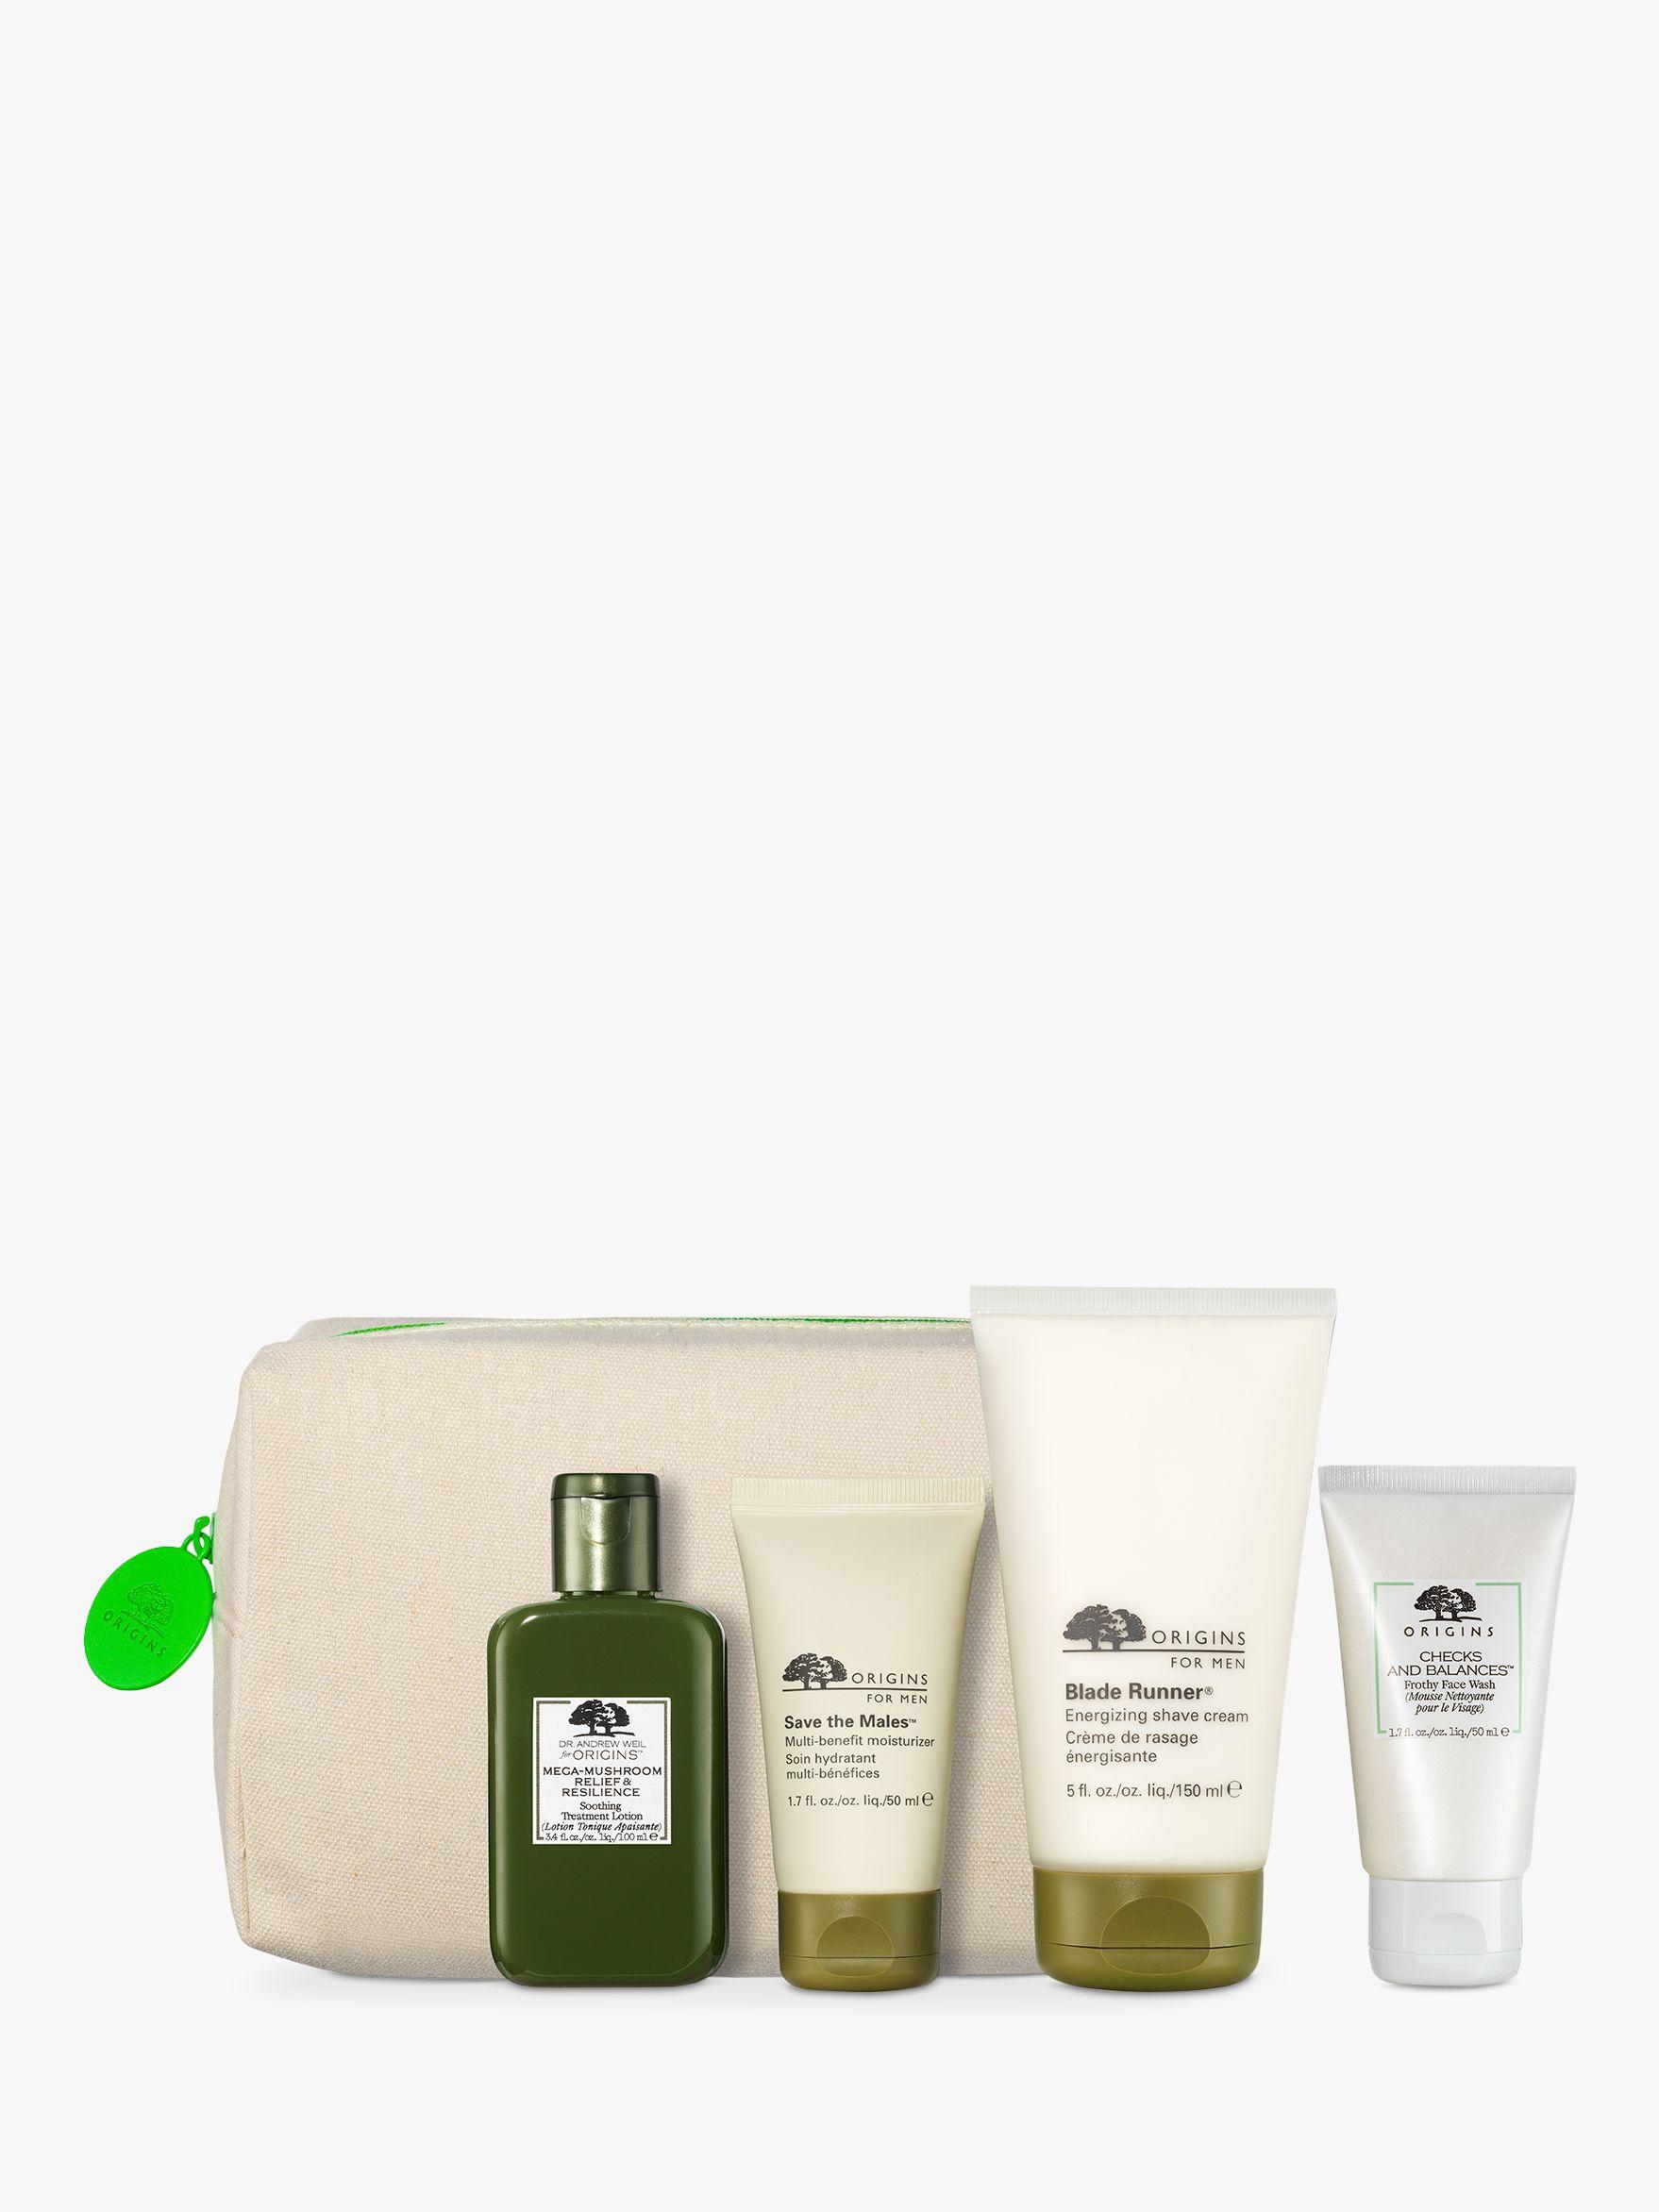 Origins Men S Best Sellers Skincare Gift Set At John Lewis Partners